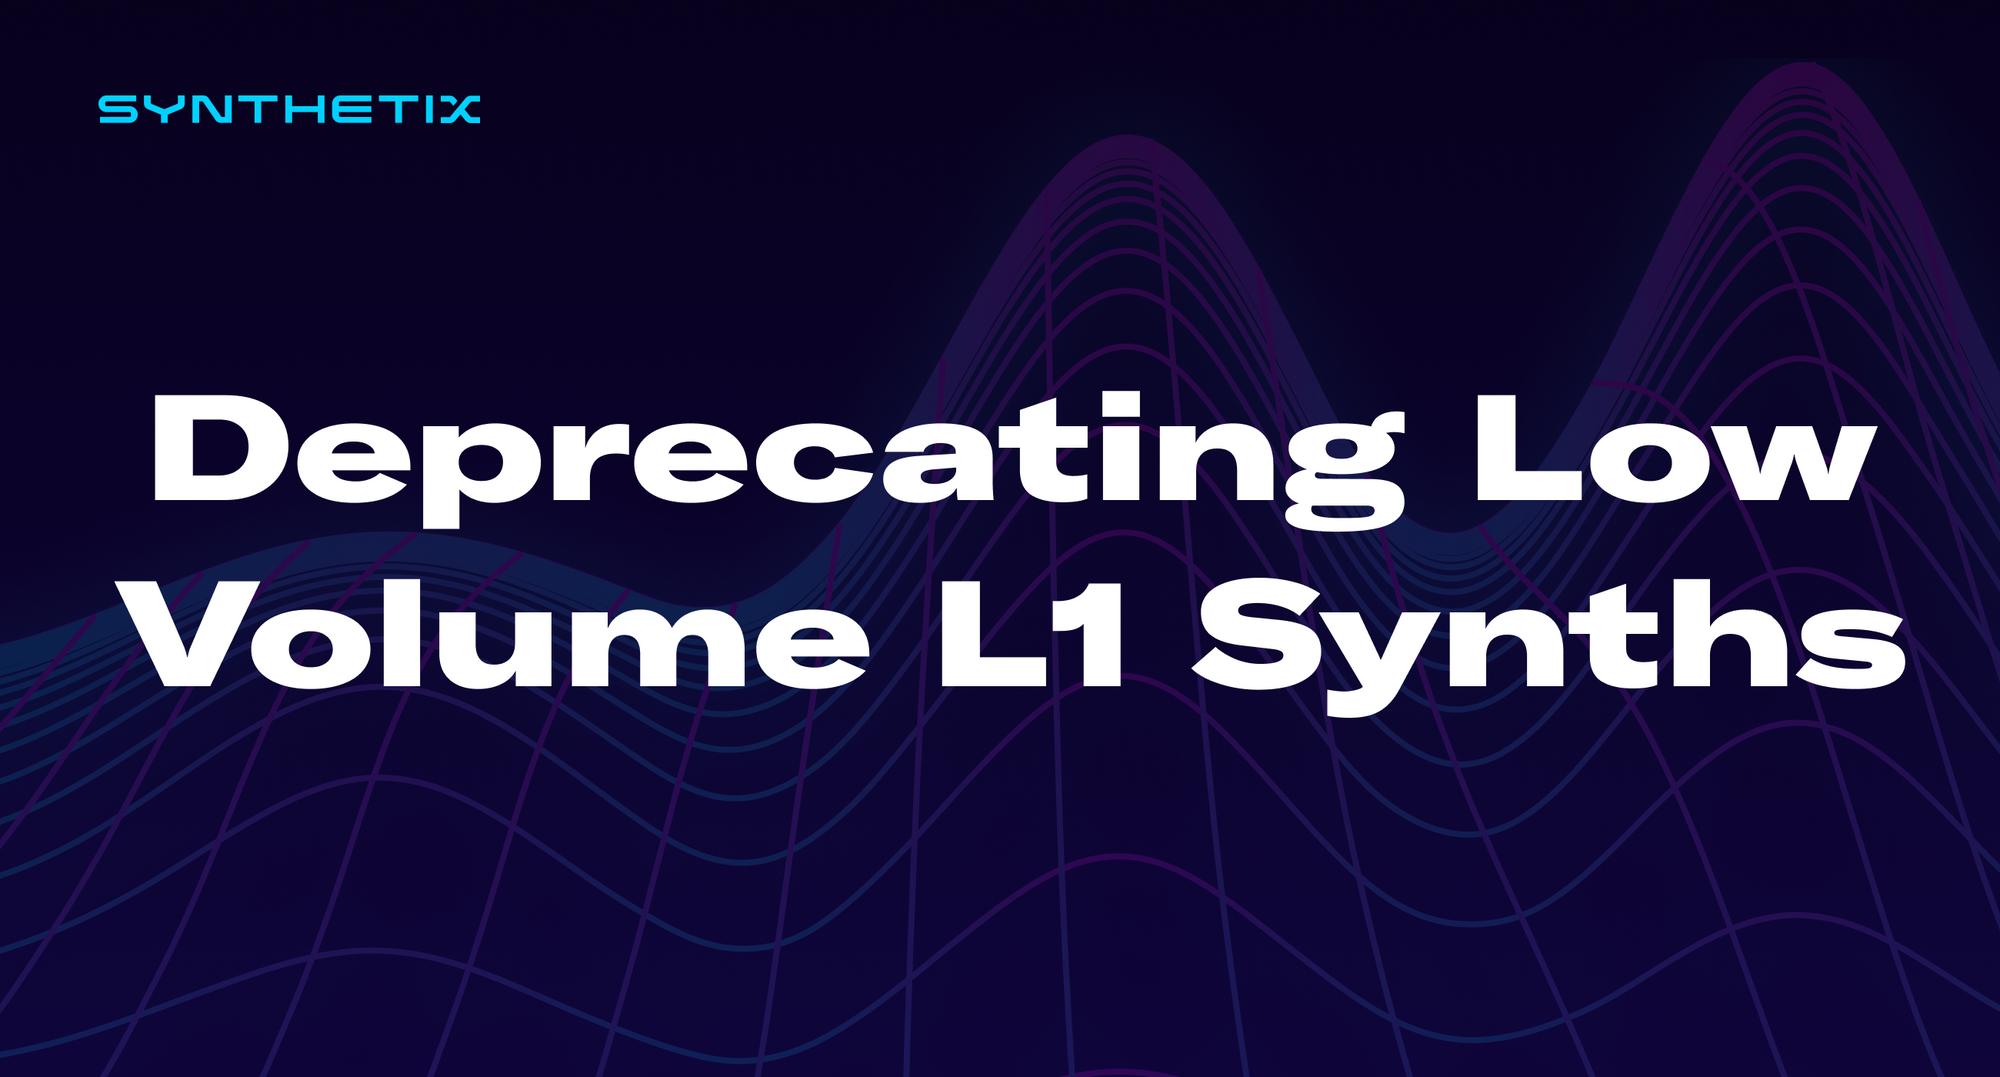 Deprecating Low Volume L1 Synths